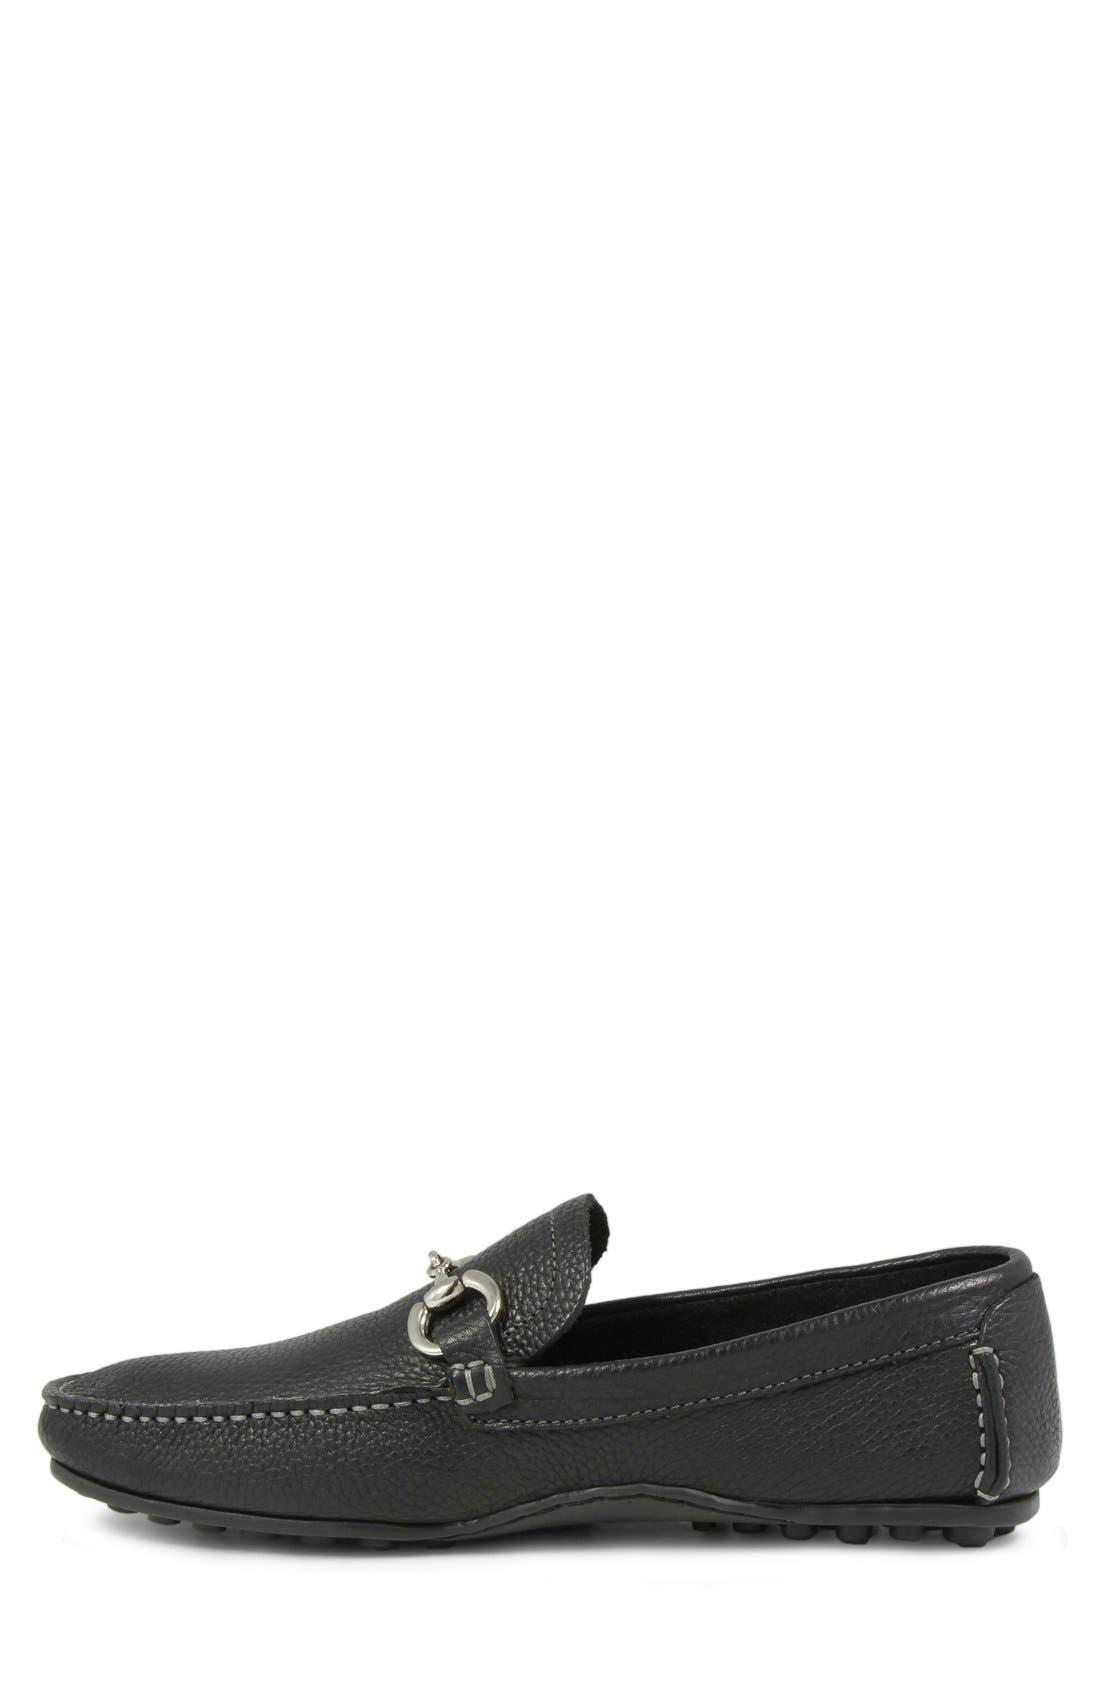 'Danforth' Driving Shoe,                             Alternate thumbnail 2, color,                             BLACK LEATHER